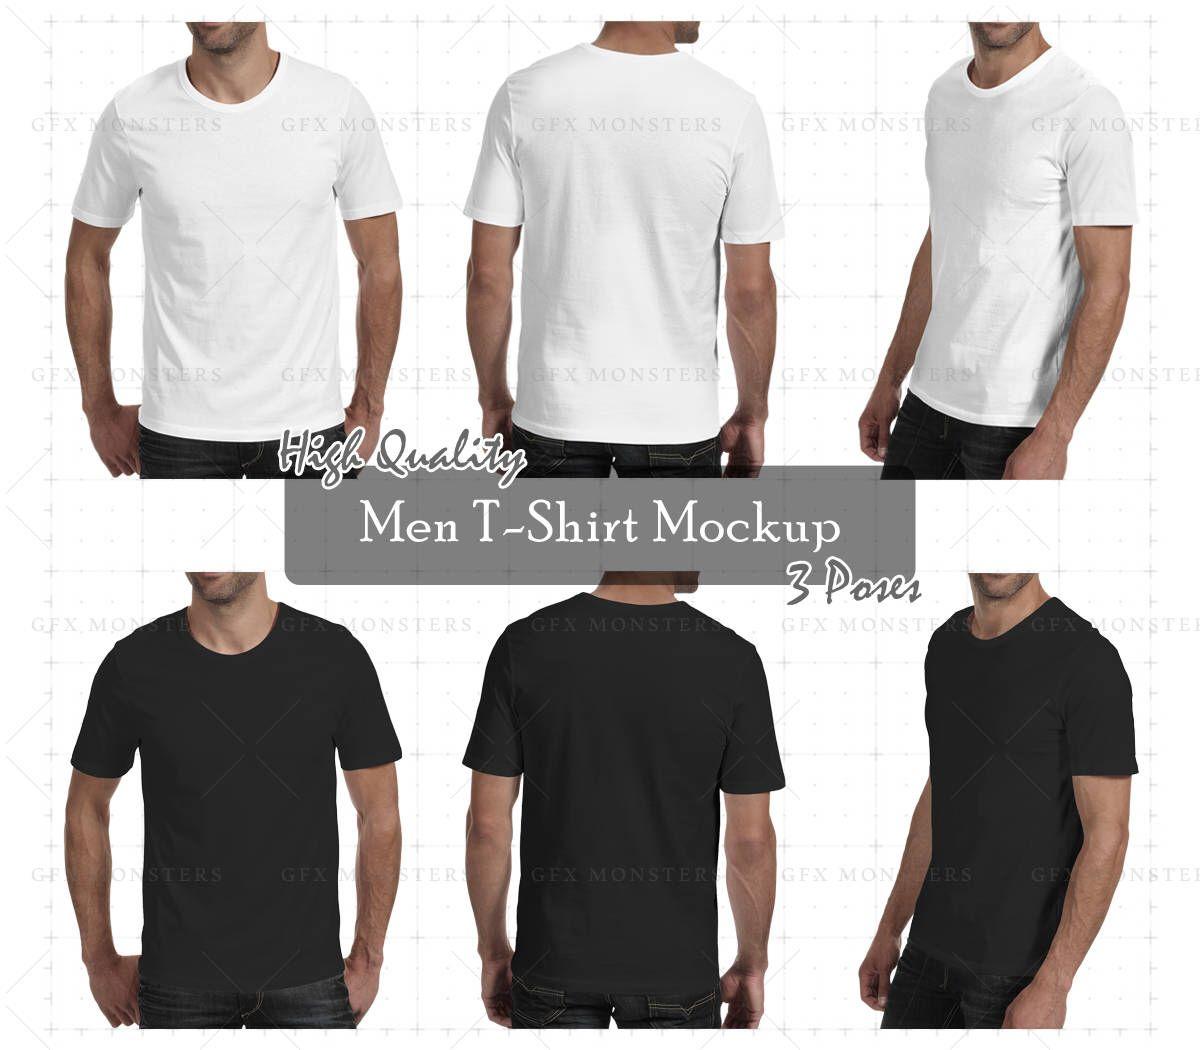 Download Men T Shirt Mockup Psd Front Back Perspective Png Psd Apparel Mock Up High Resolution Mock Up Instant Download In 2021 Clothing Mockup Tshirt Mockup Shirt Mockup